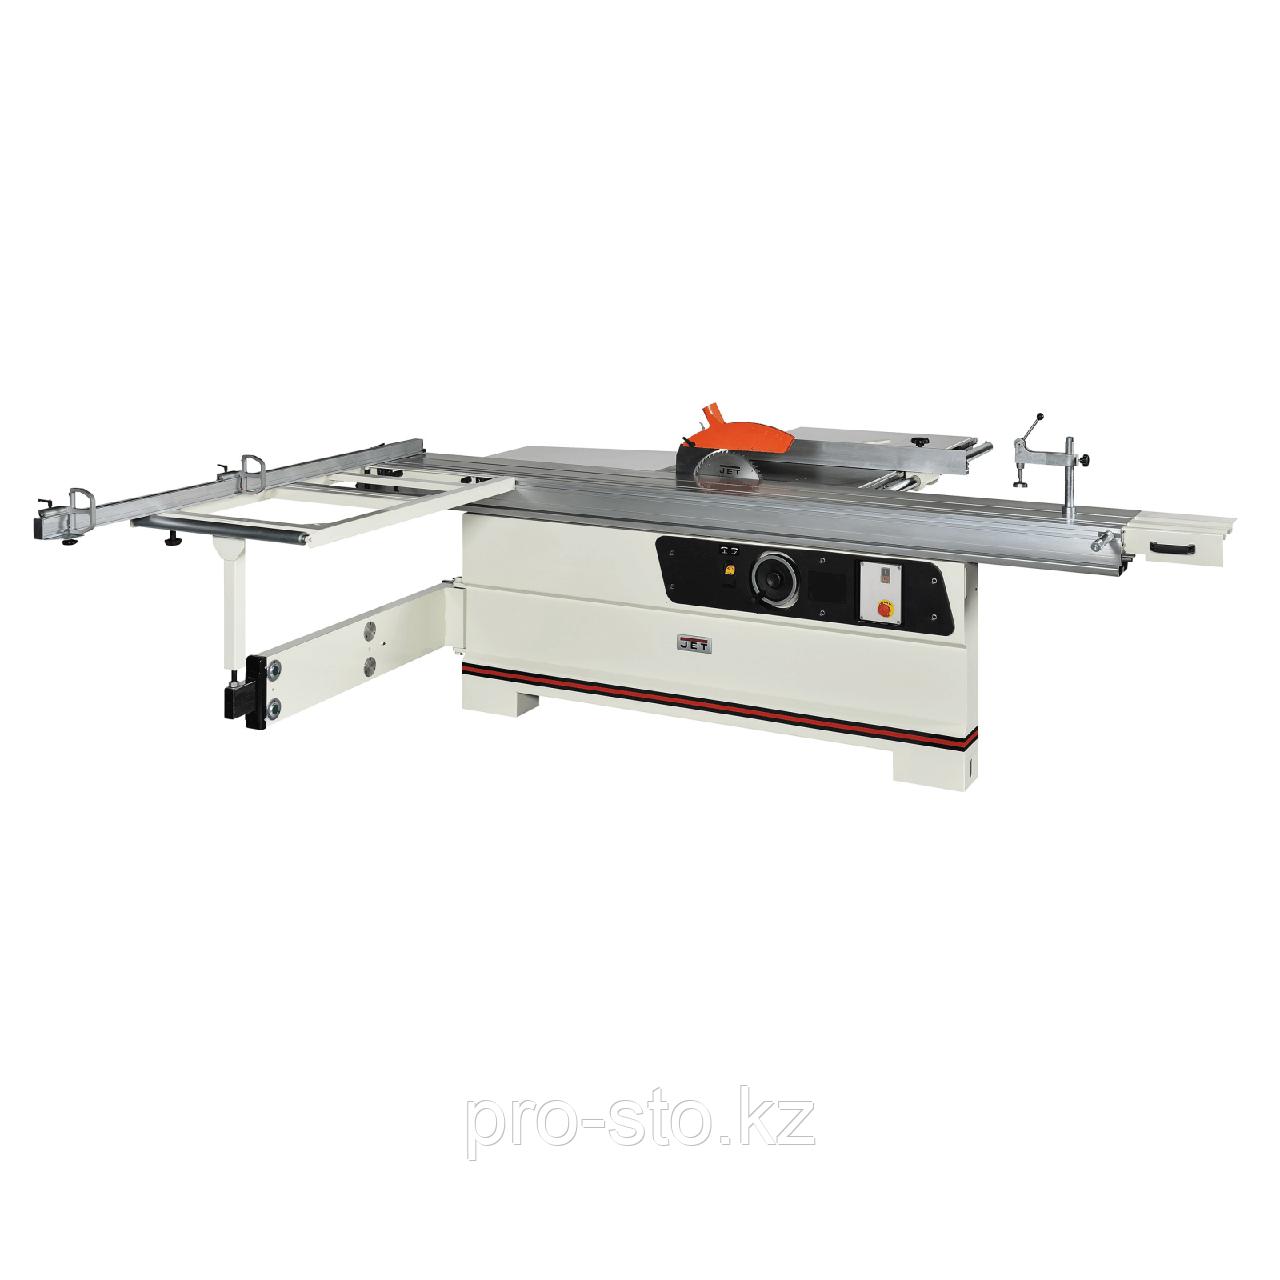 Форматно-раскроечный станок JTSS-3200X  Артикул: 10000047XT